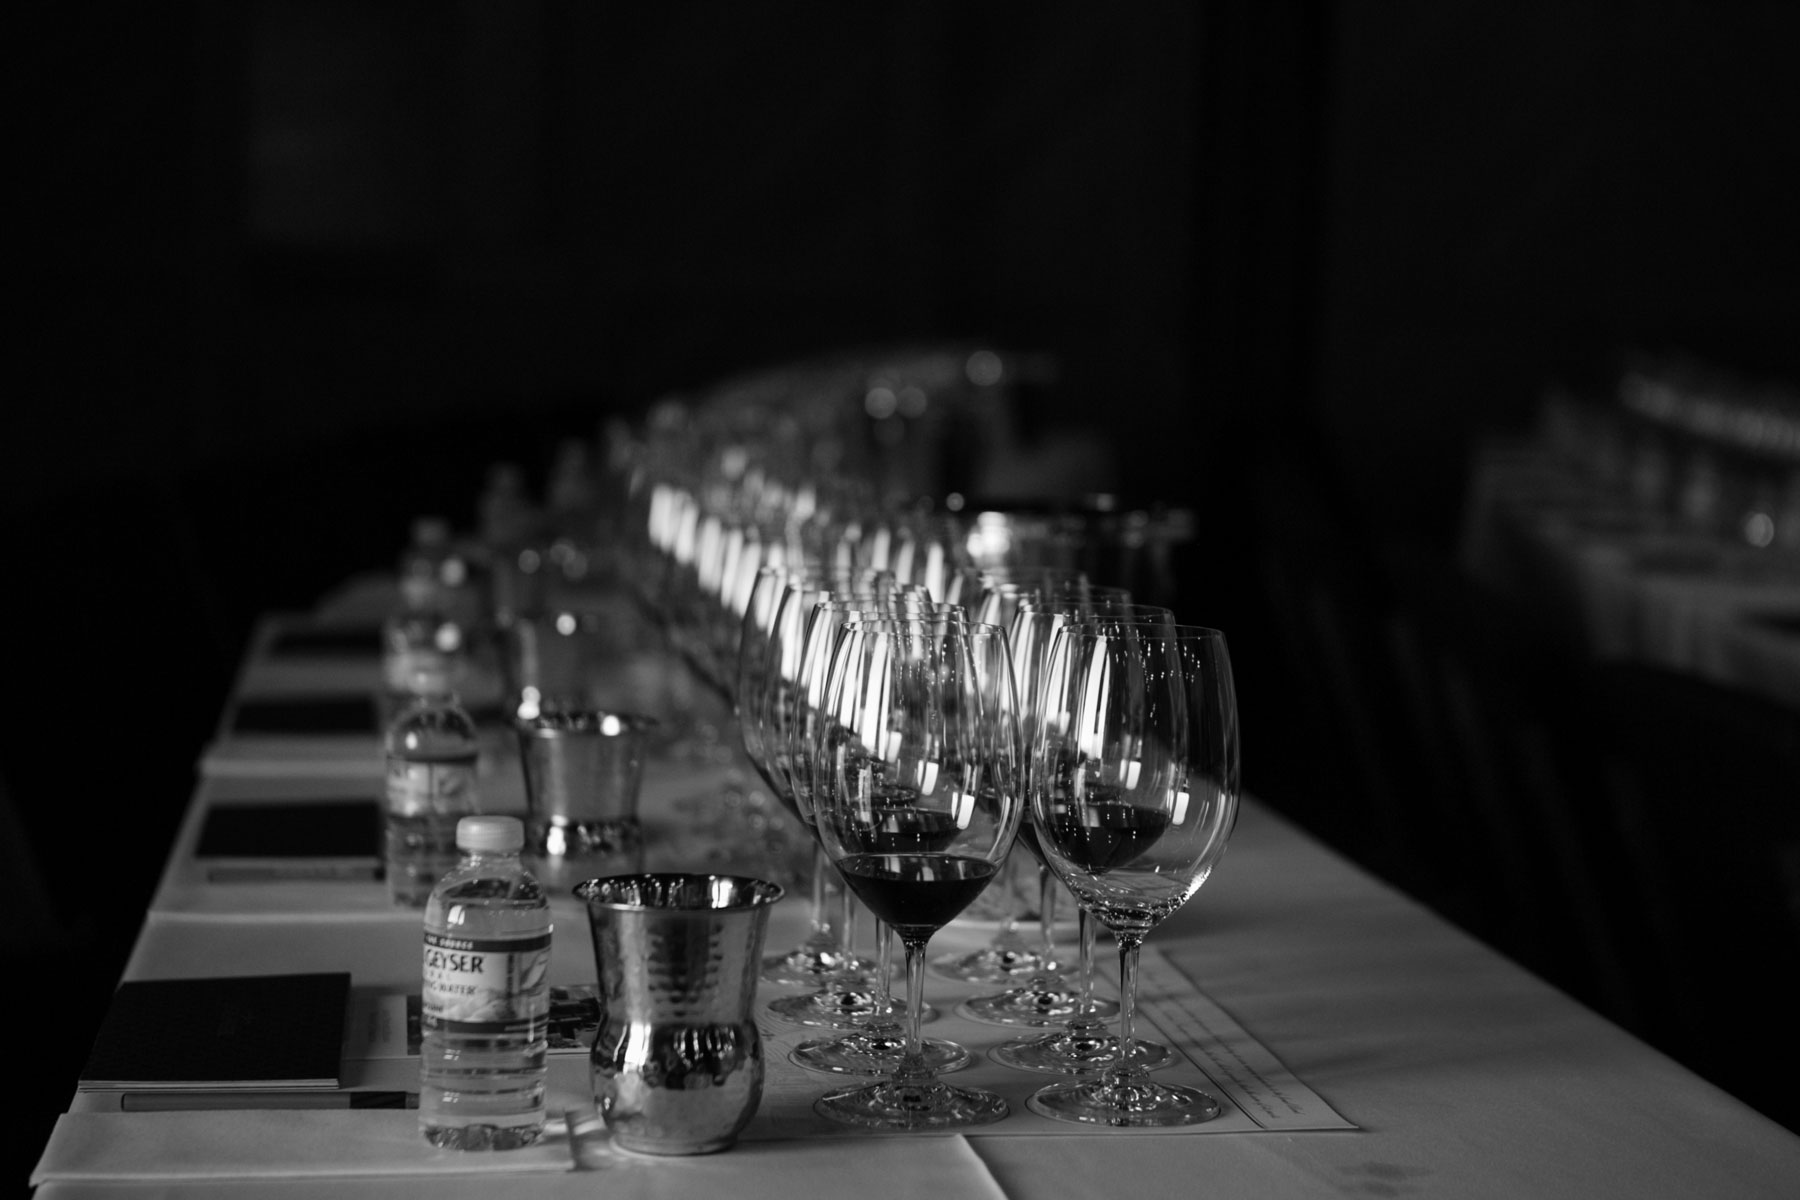 Beringer-Vineyards-Private-Reserve-9-Cabernet-Sauvignon-Release